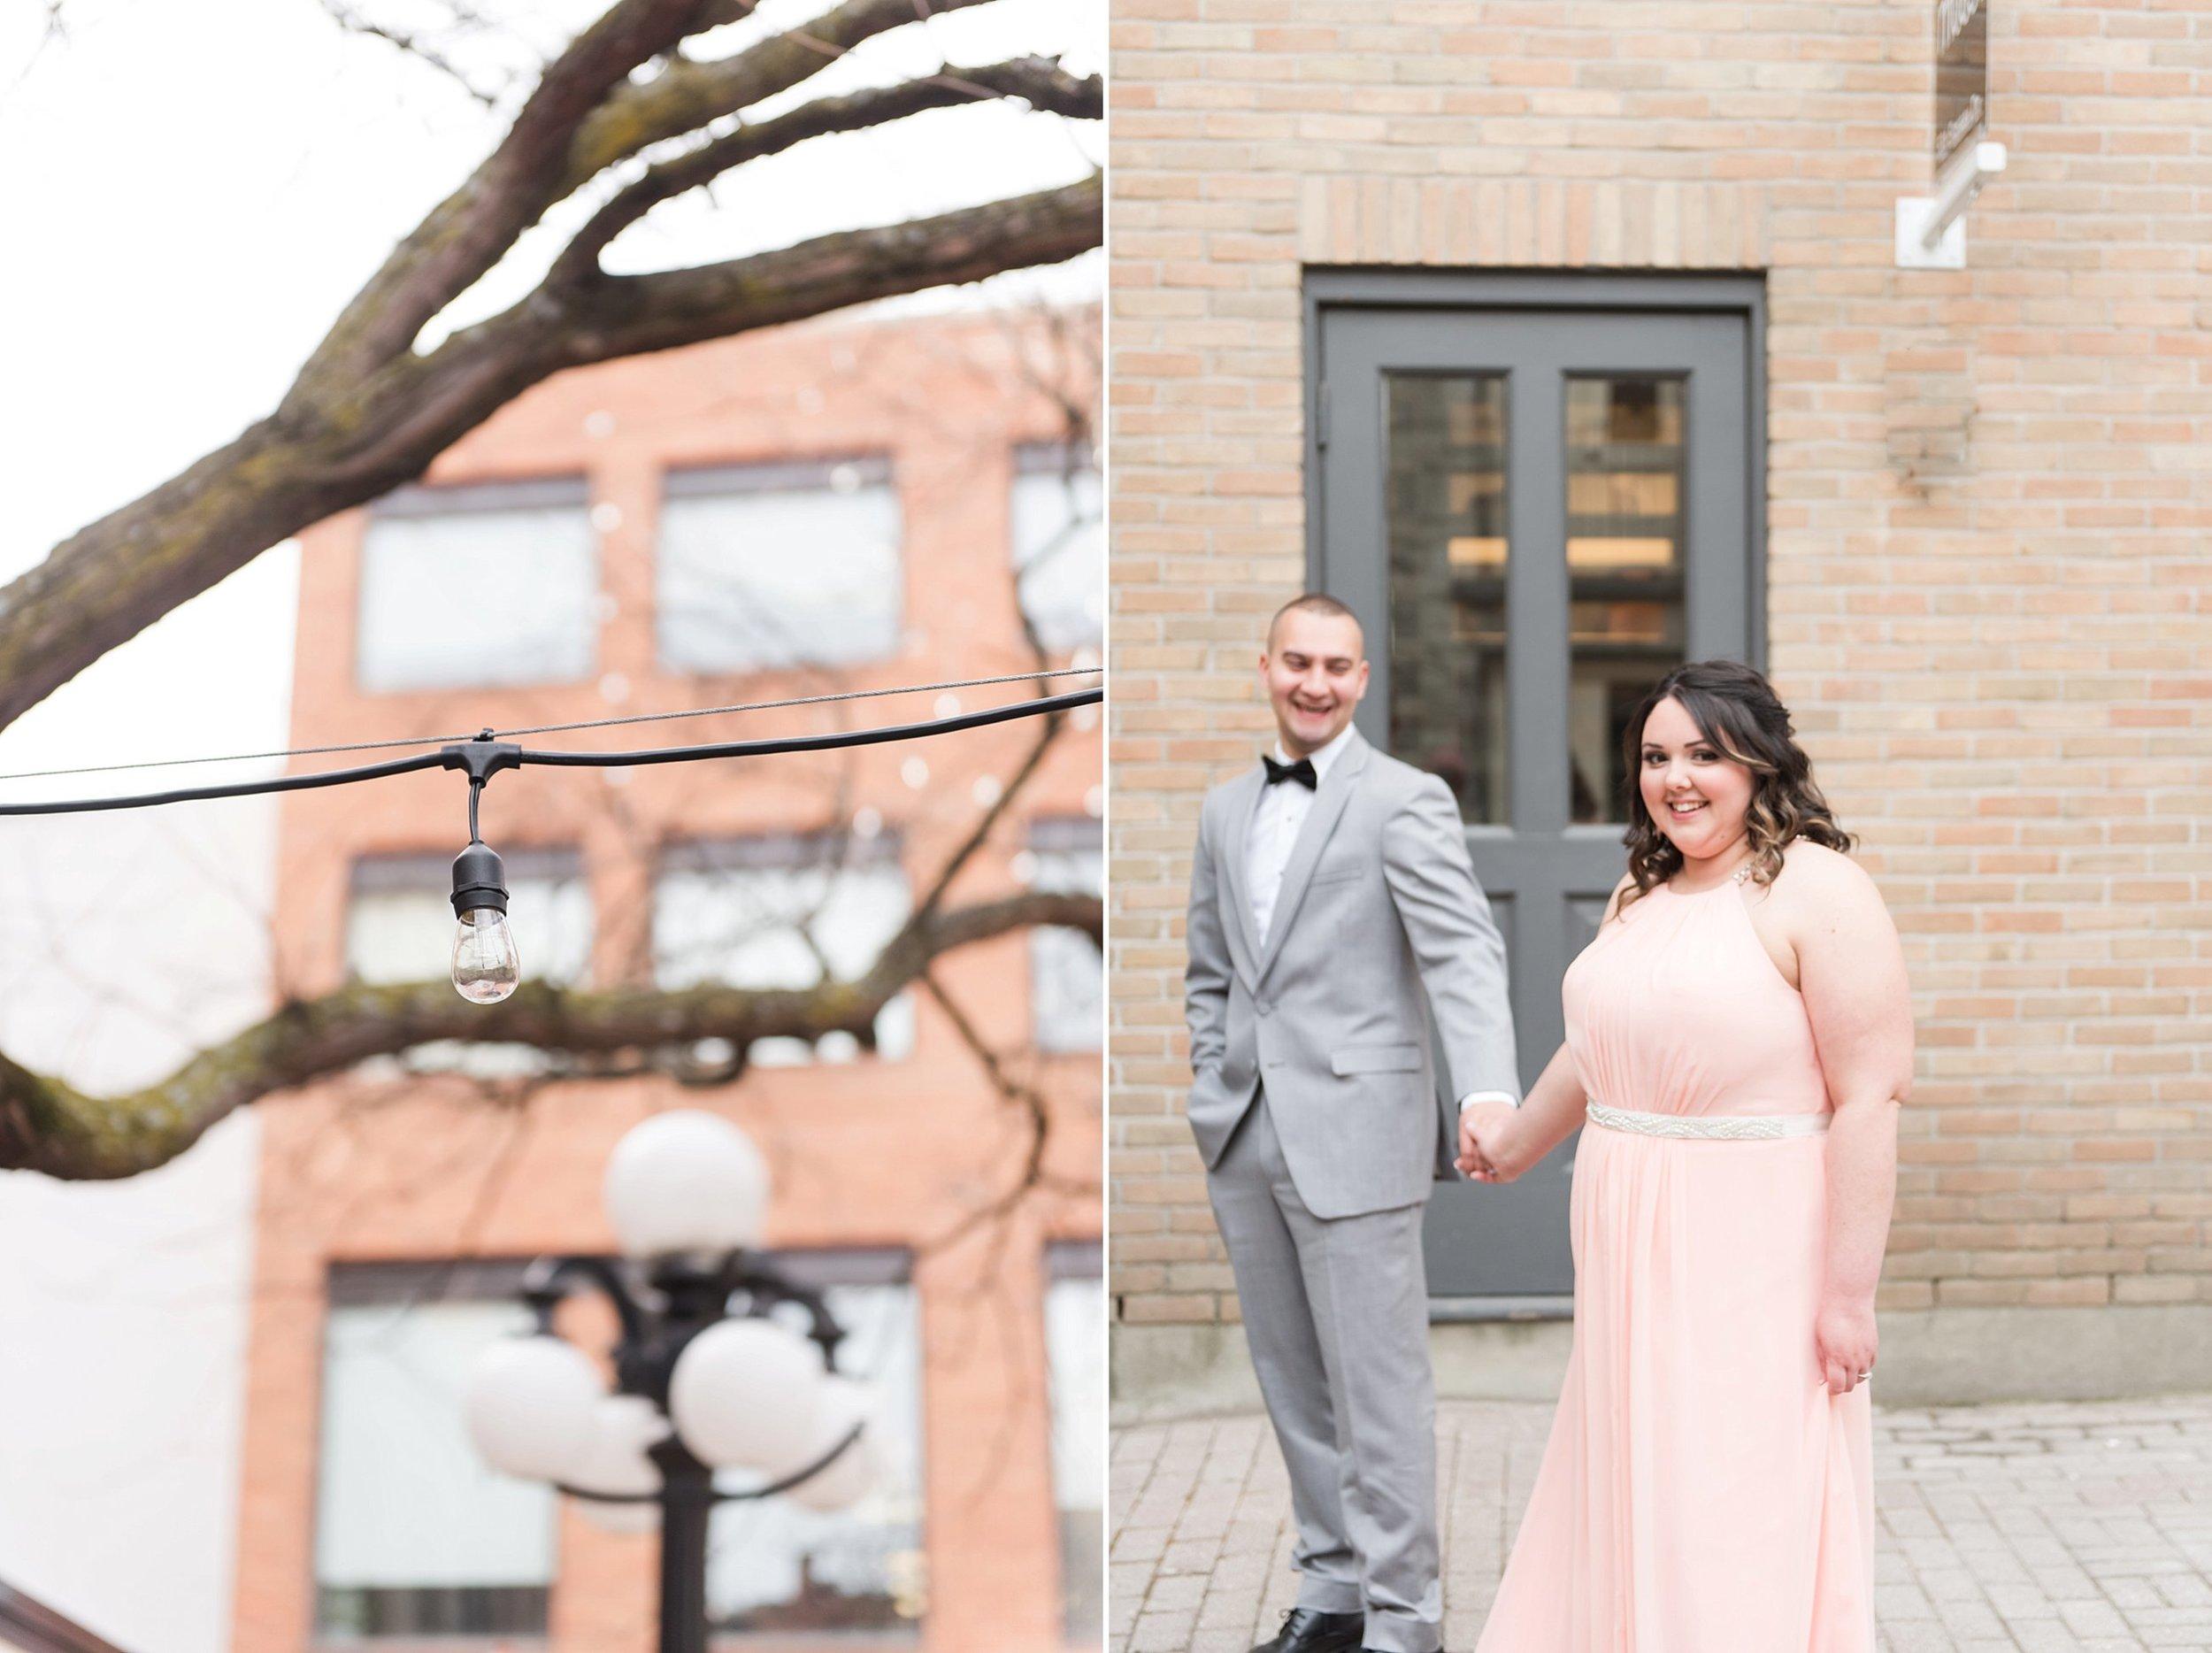 Sarmad Ashley Engagement Shoot- Ali Batoul Creatives Fine Art Wedding Photography_0052.jpg